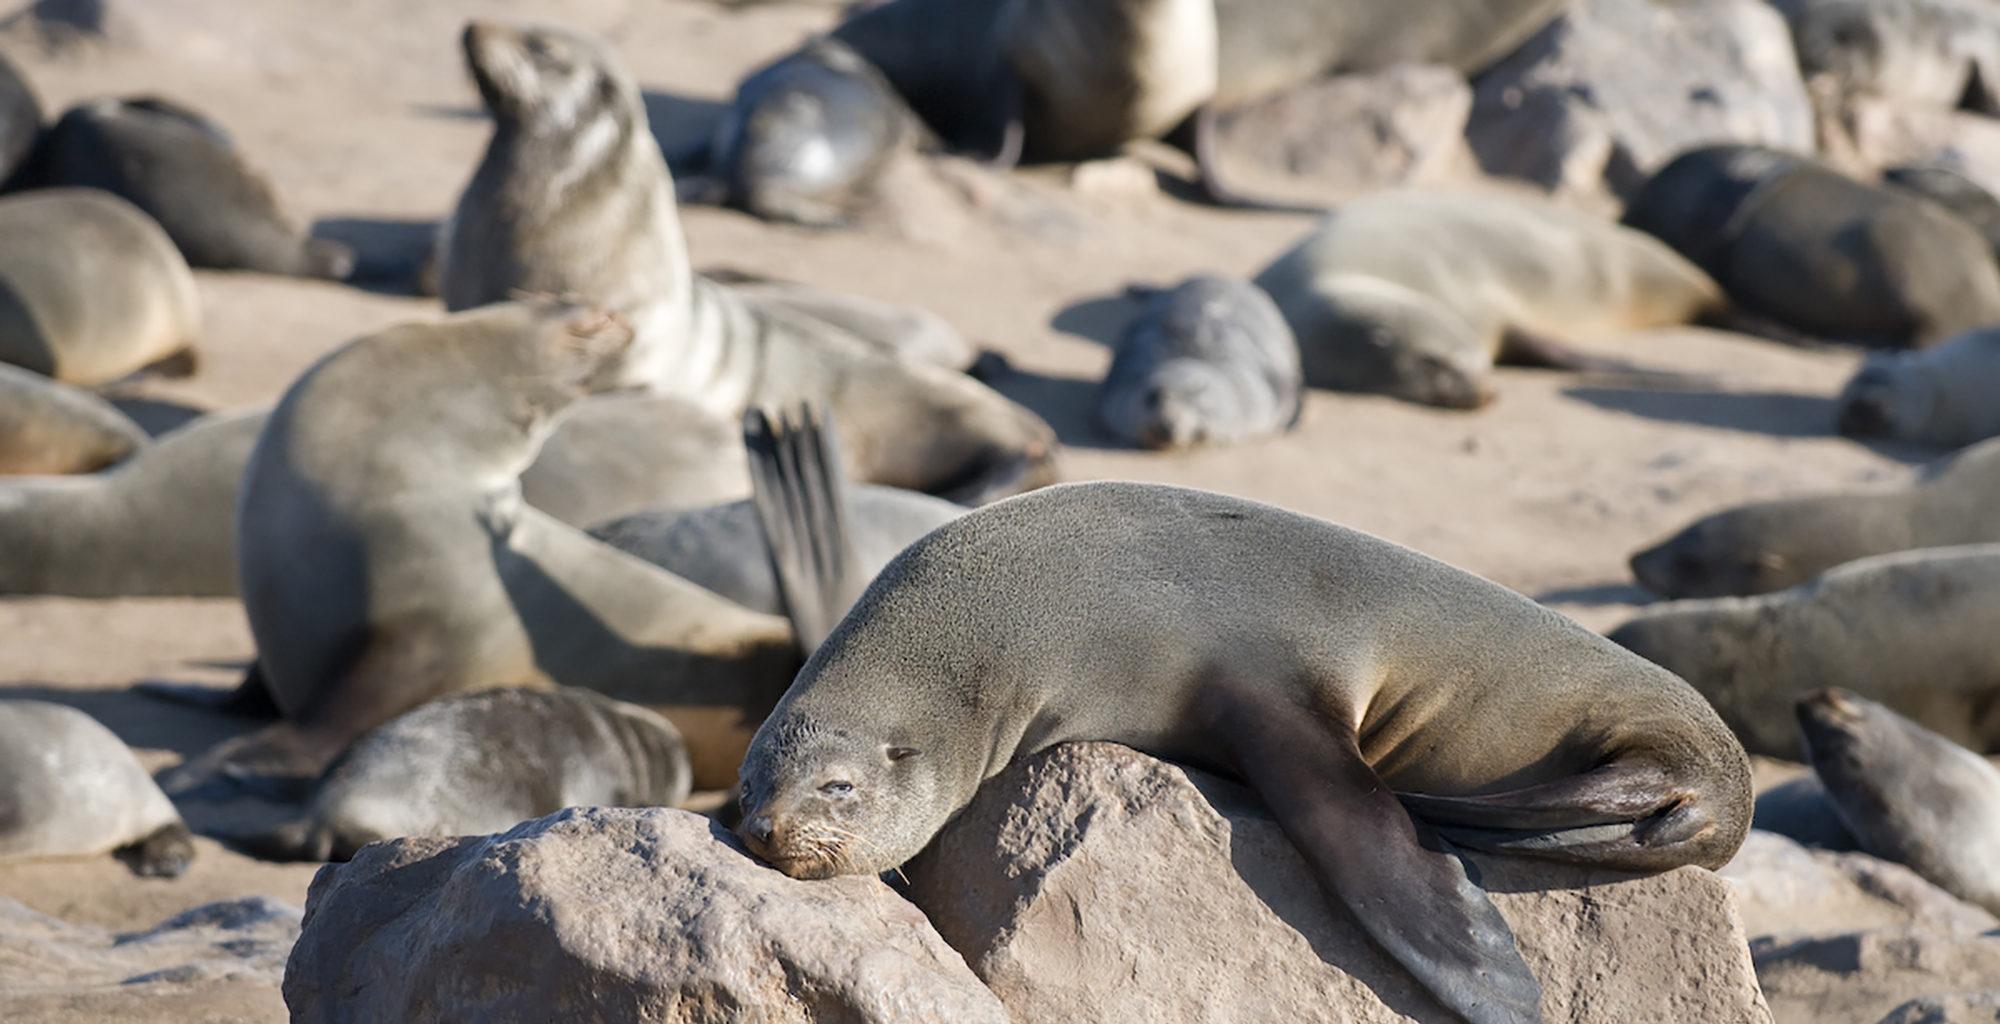 Namibia-Damaraland-Adventurer-Seal